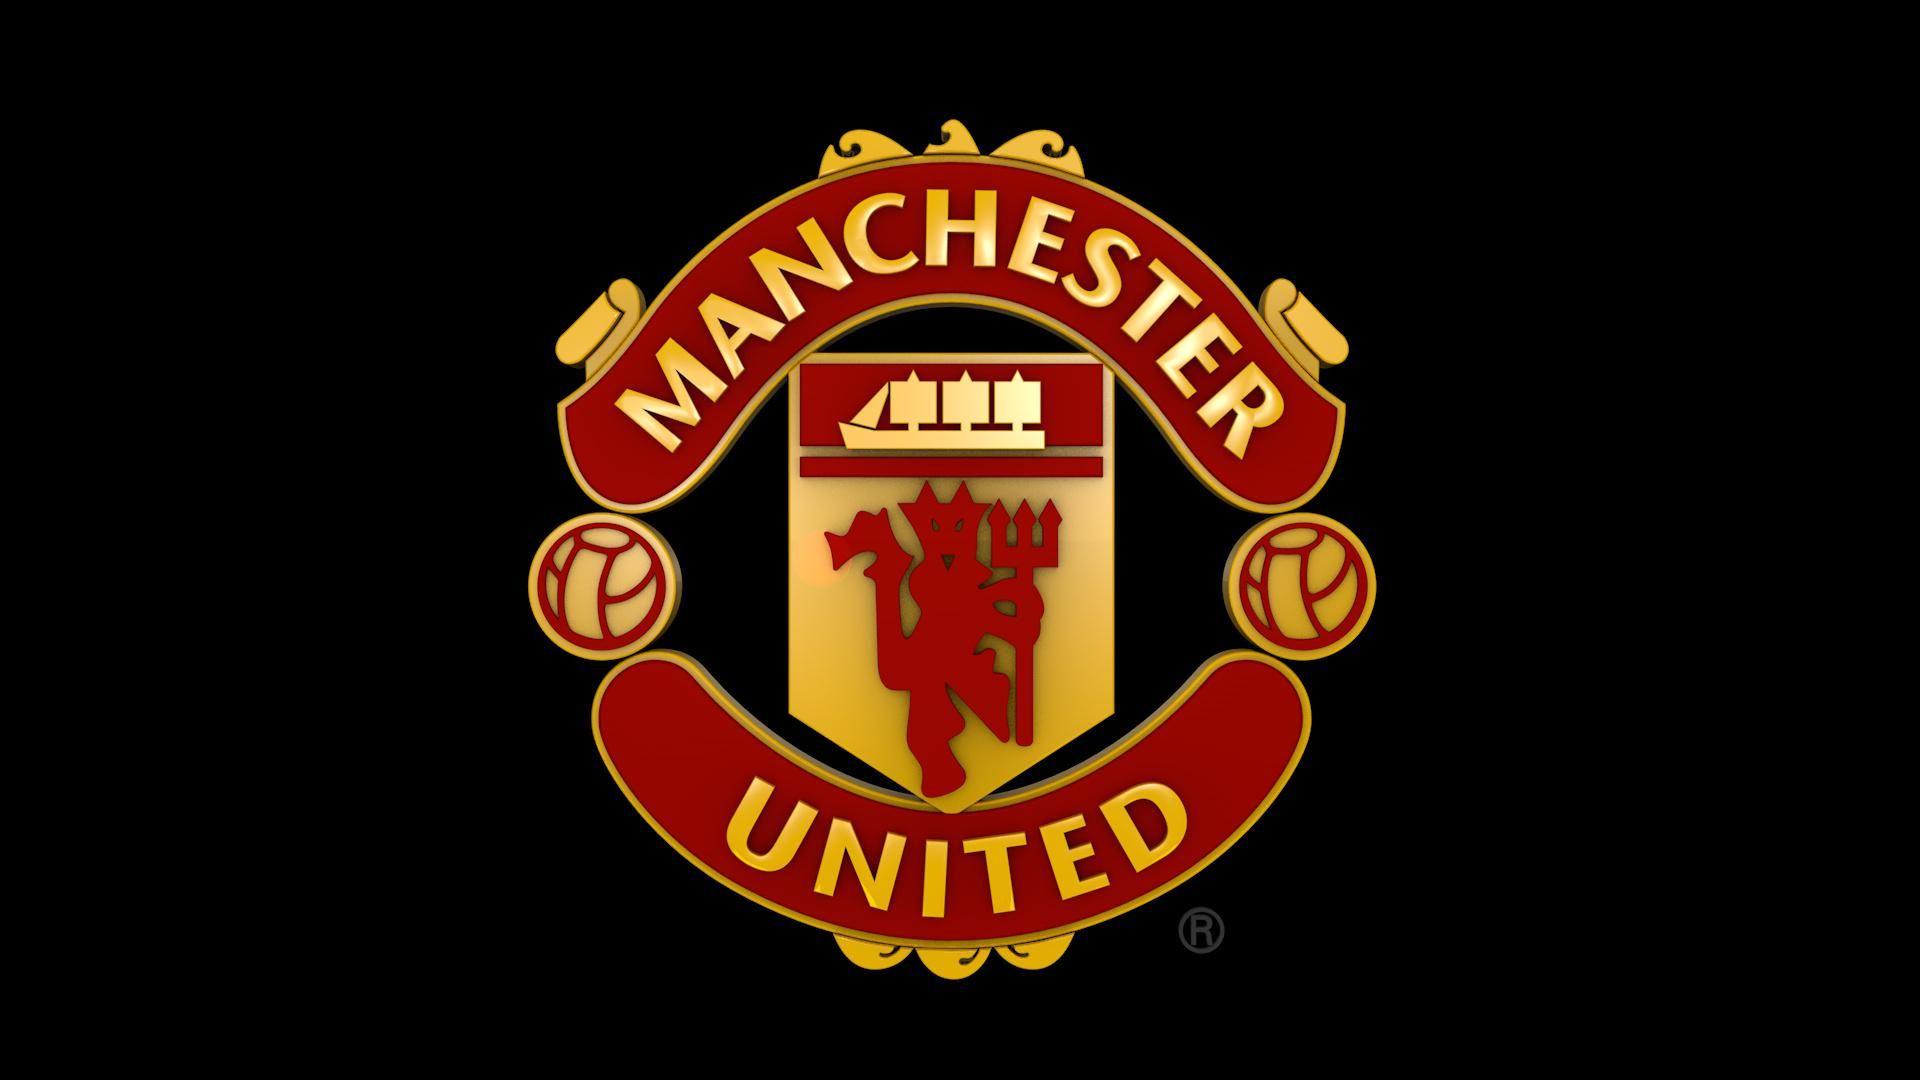 Manchester United Logo 3d Model Ad United Manchester Model Logo โลโก วอลเปเปอร